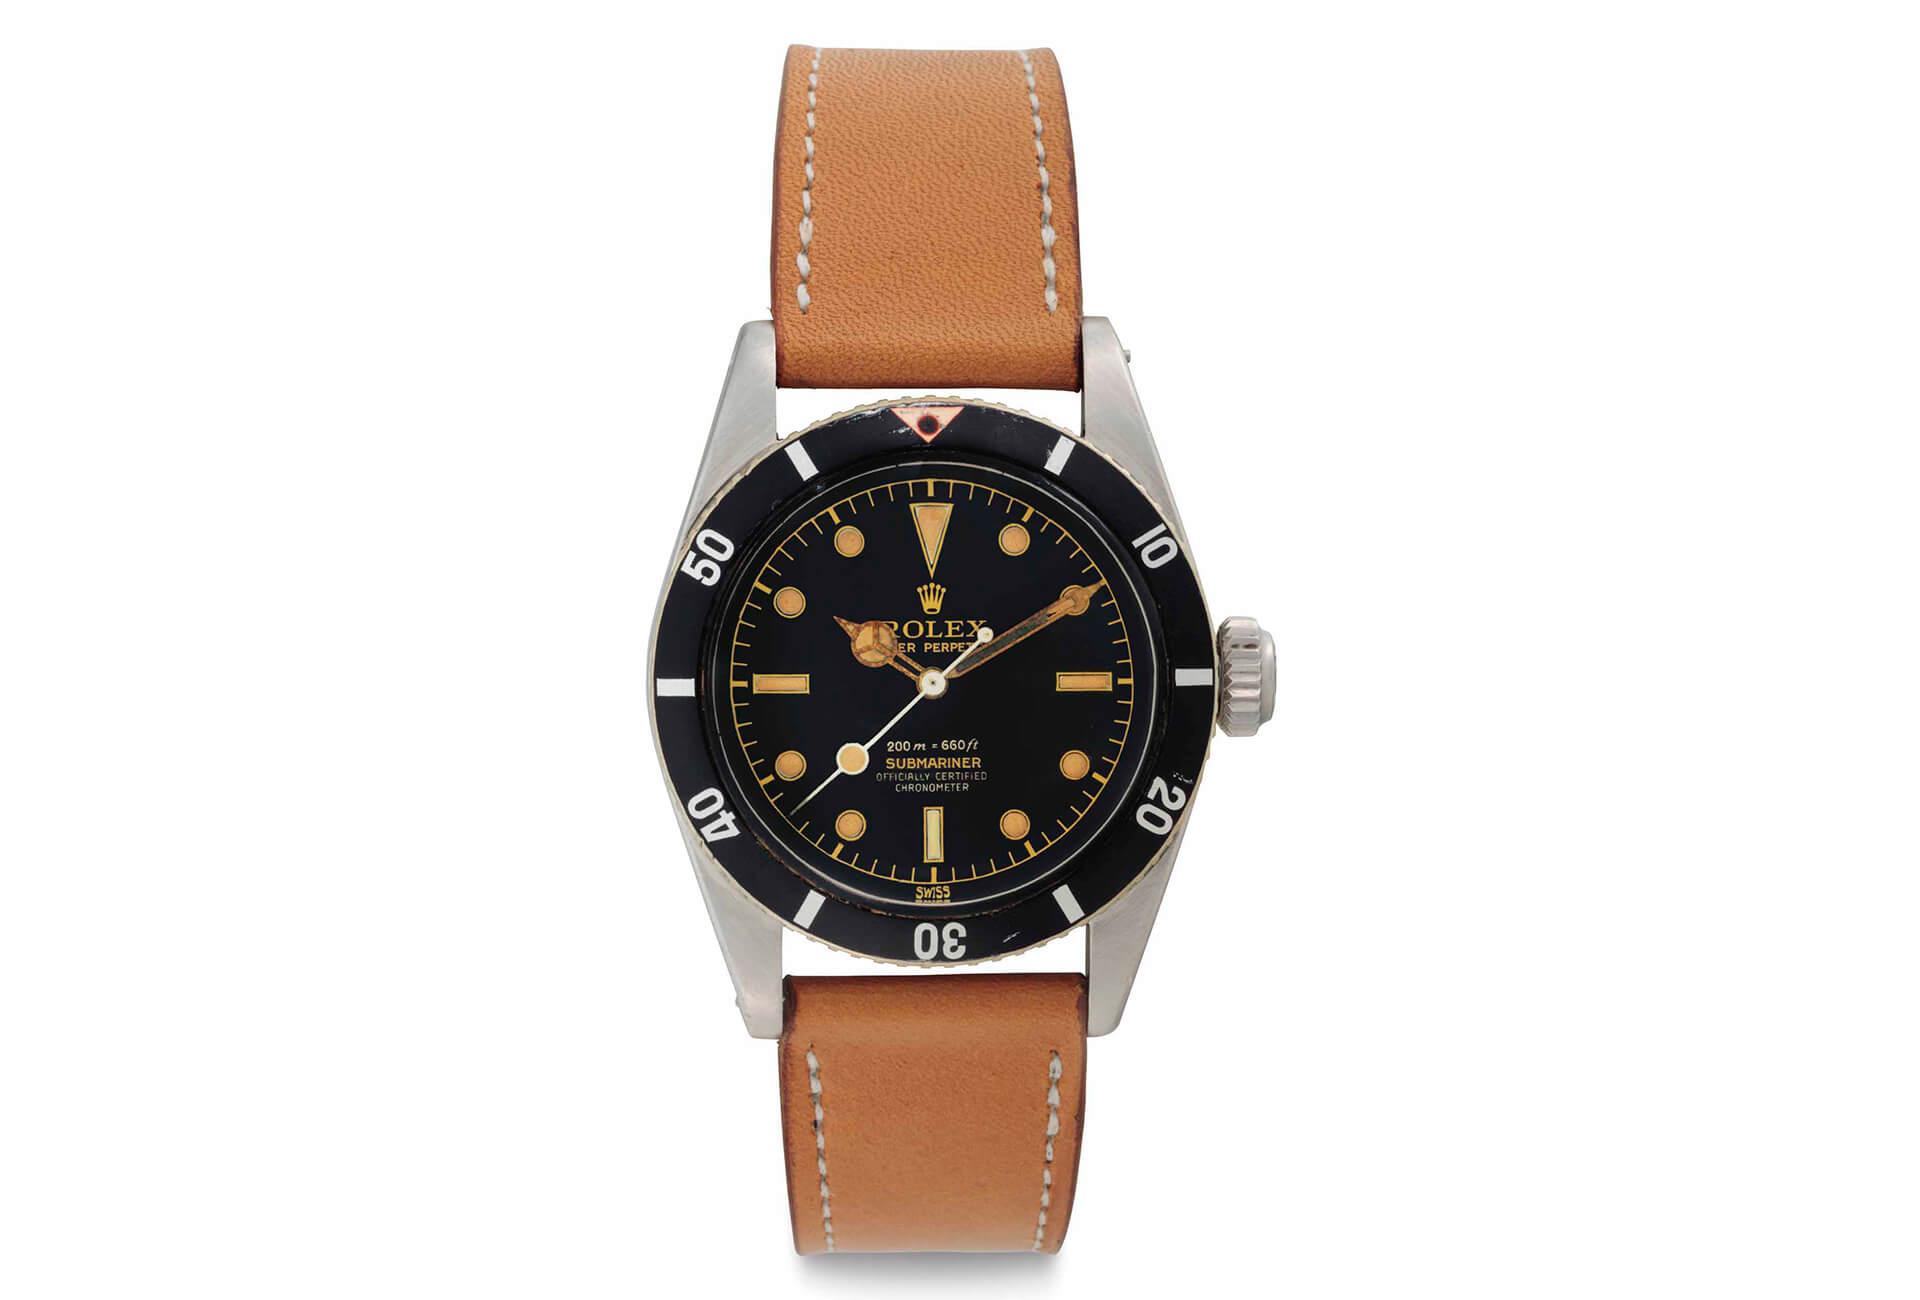 f66cce246d3 Christie s ventes de New York   Rolex Oyster Perpetual Submariner Référence  6538